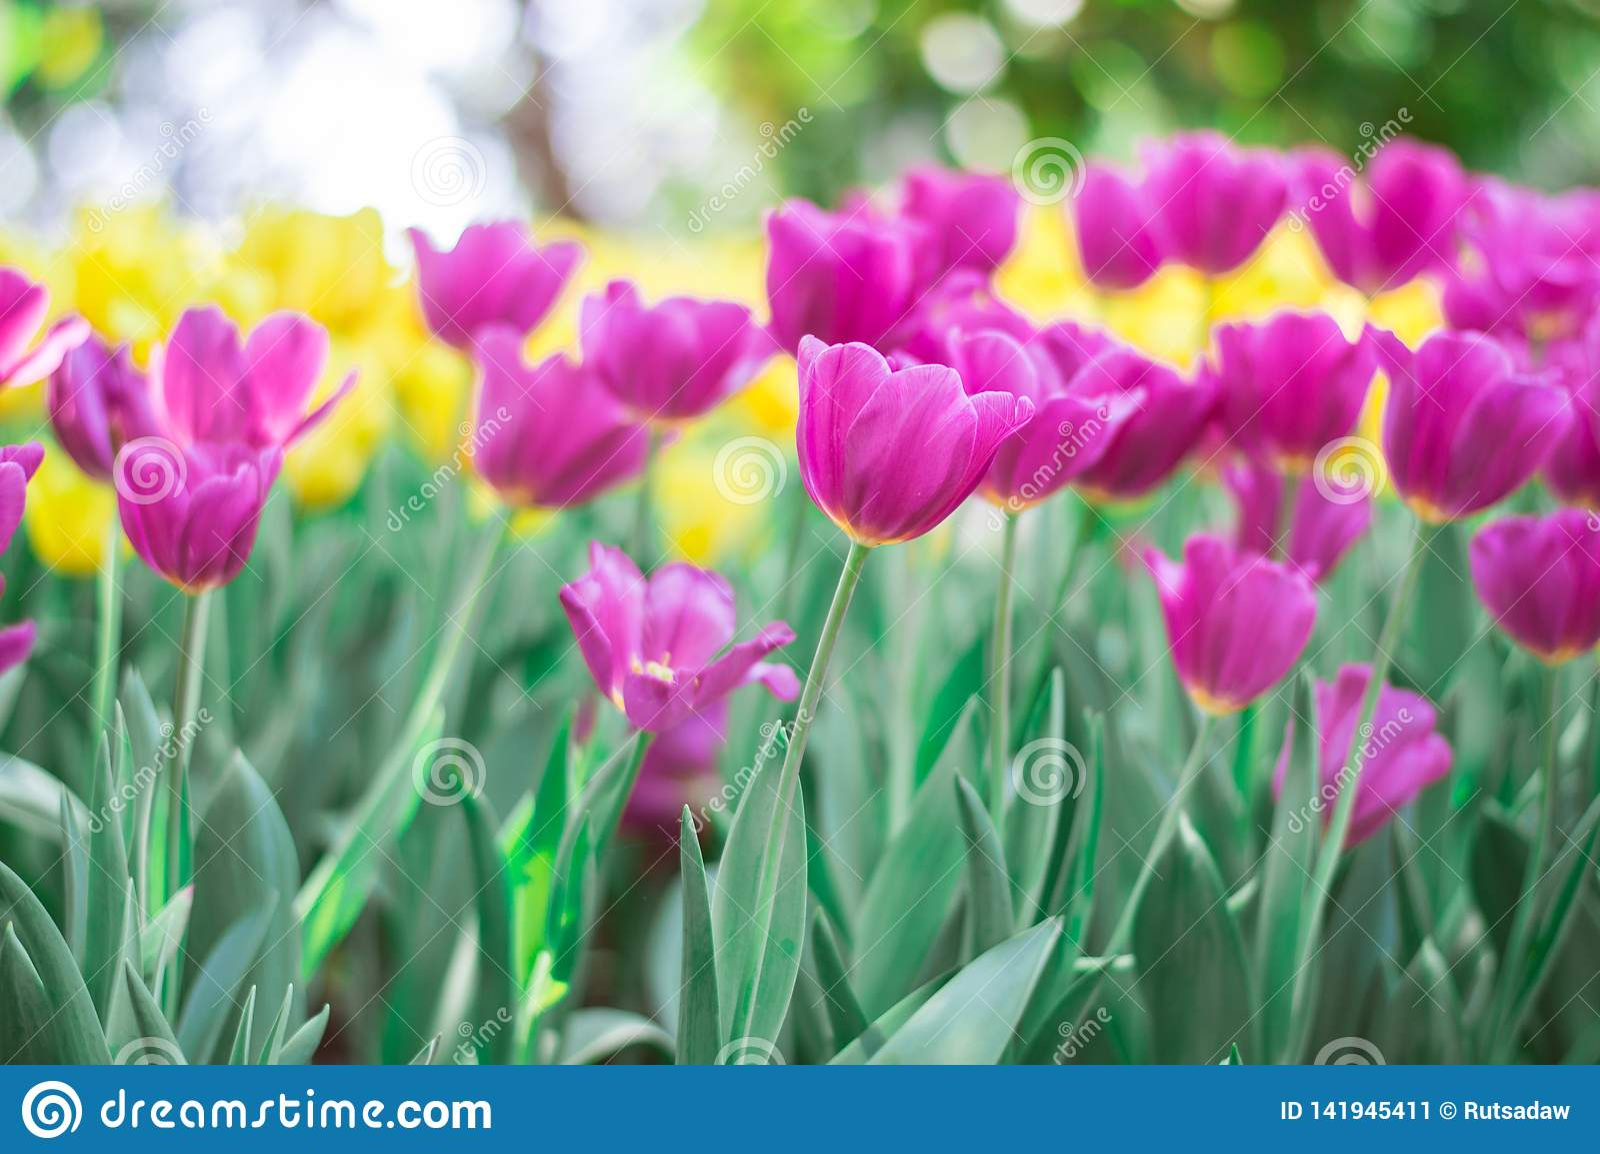 Fleur rose de tulipes dans le jardin